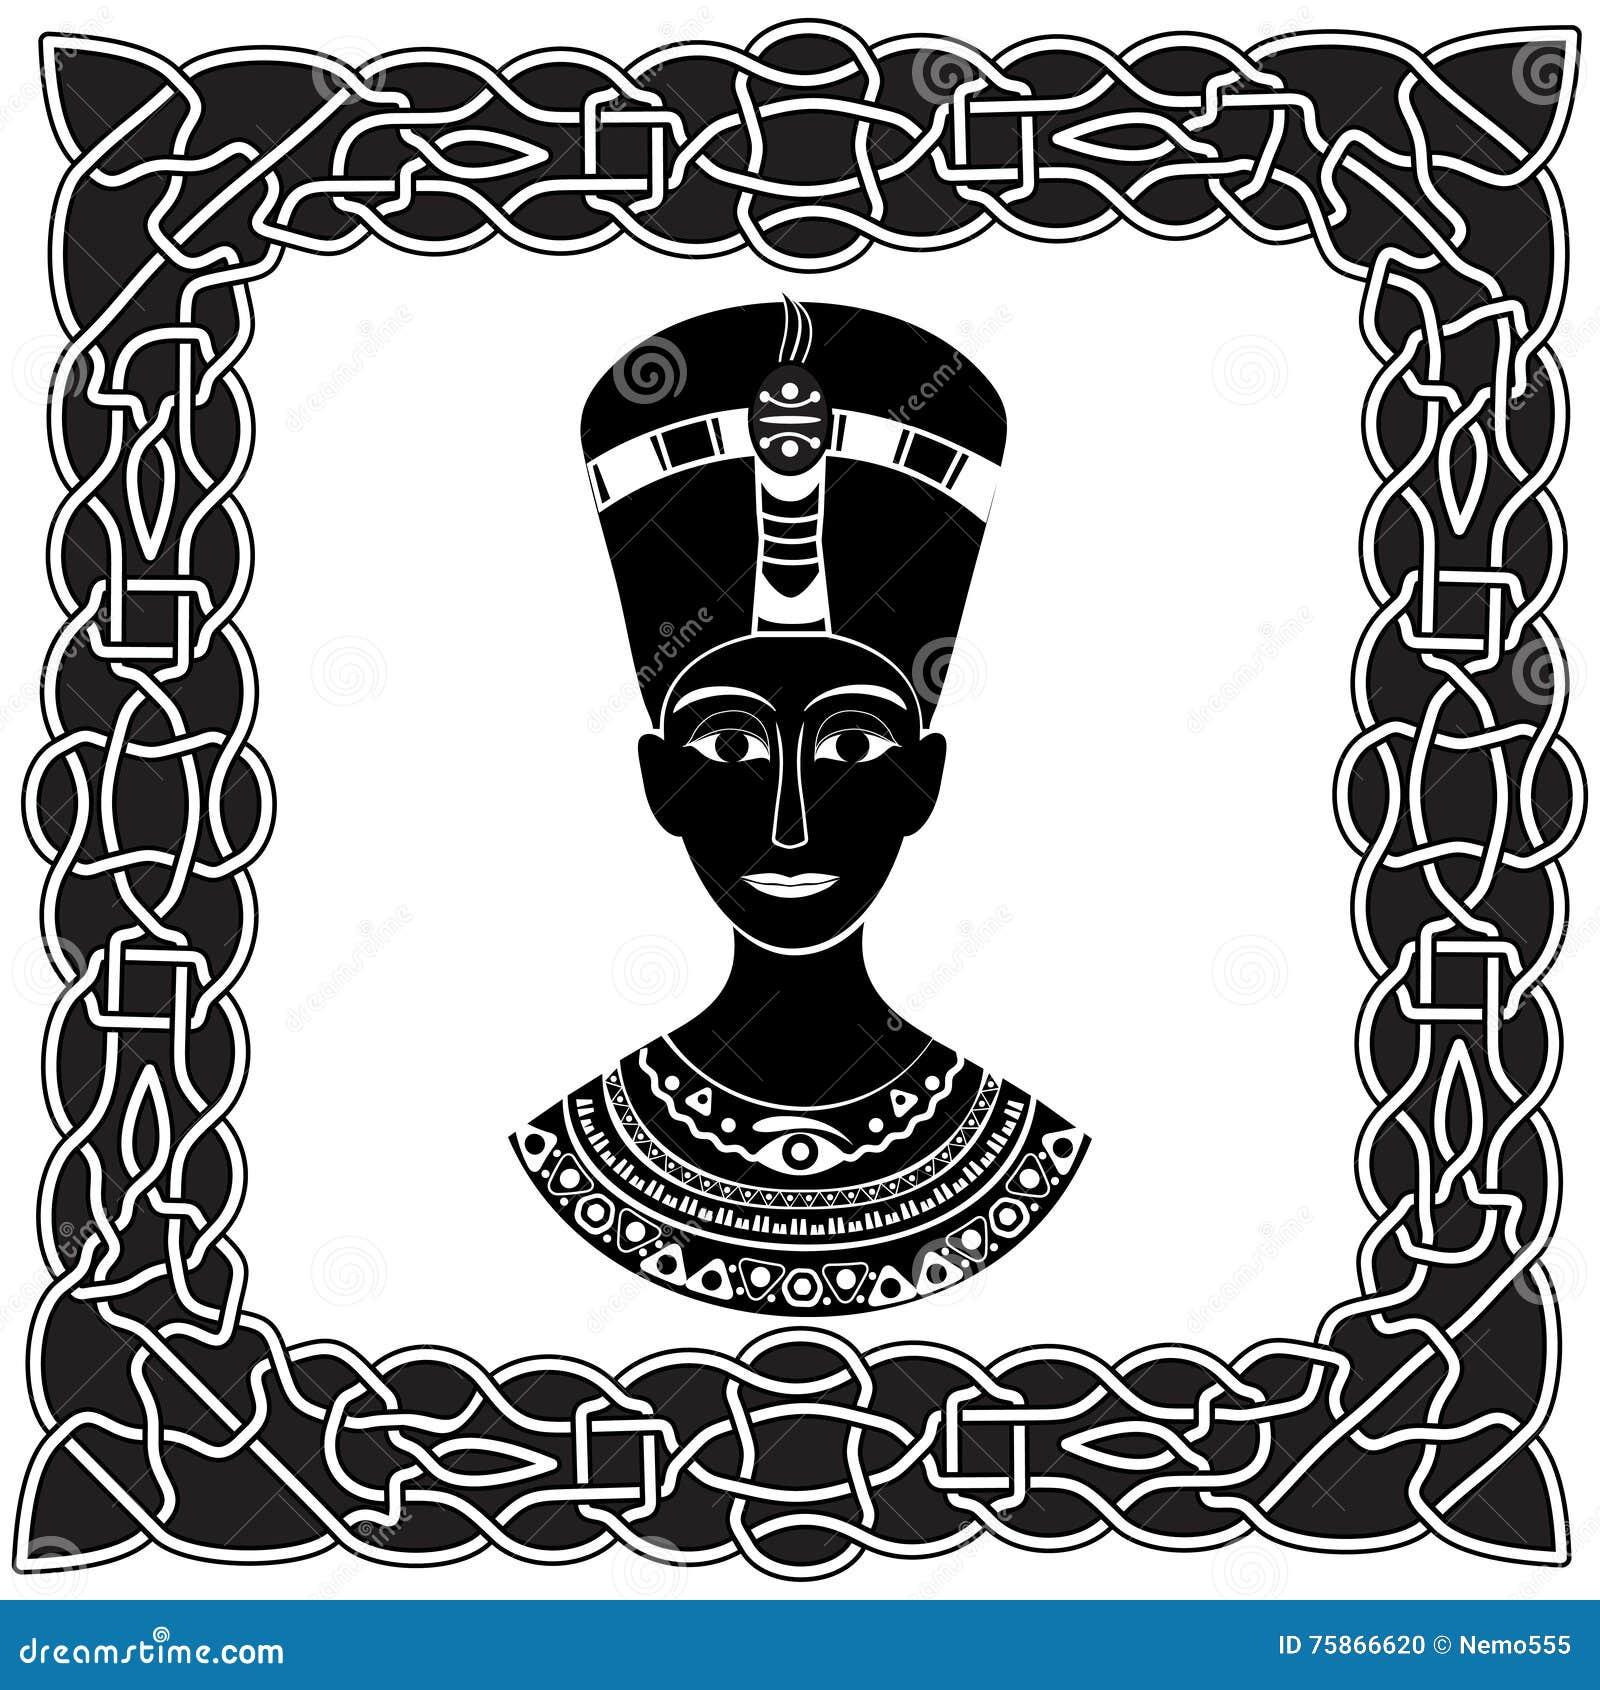 nefertiti and cleopatra